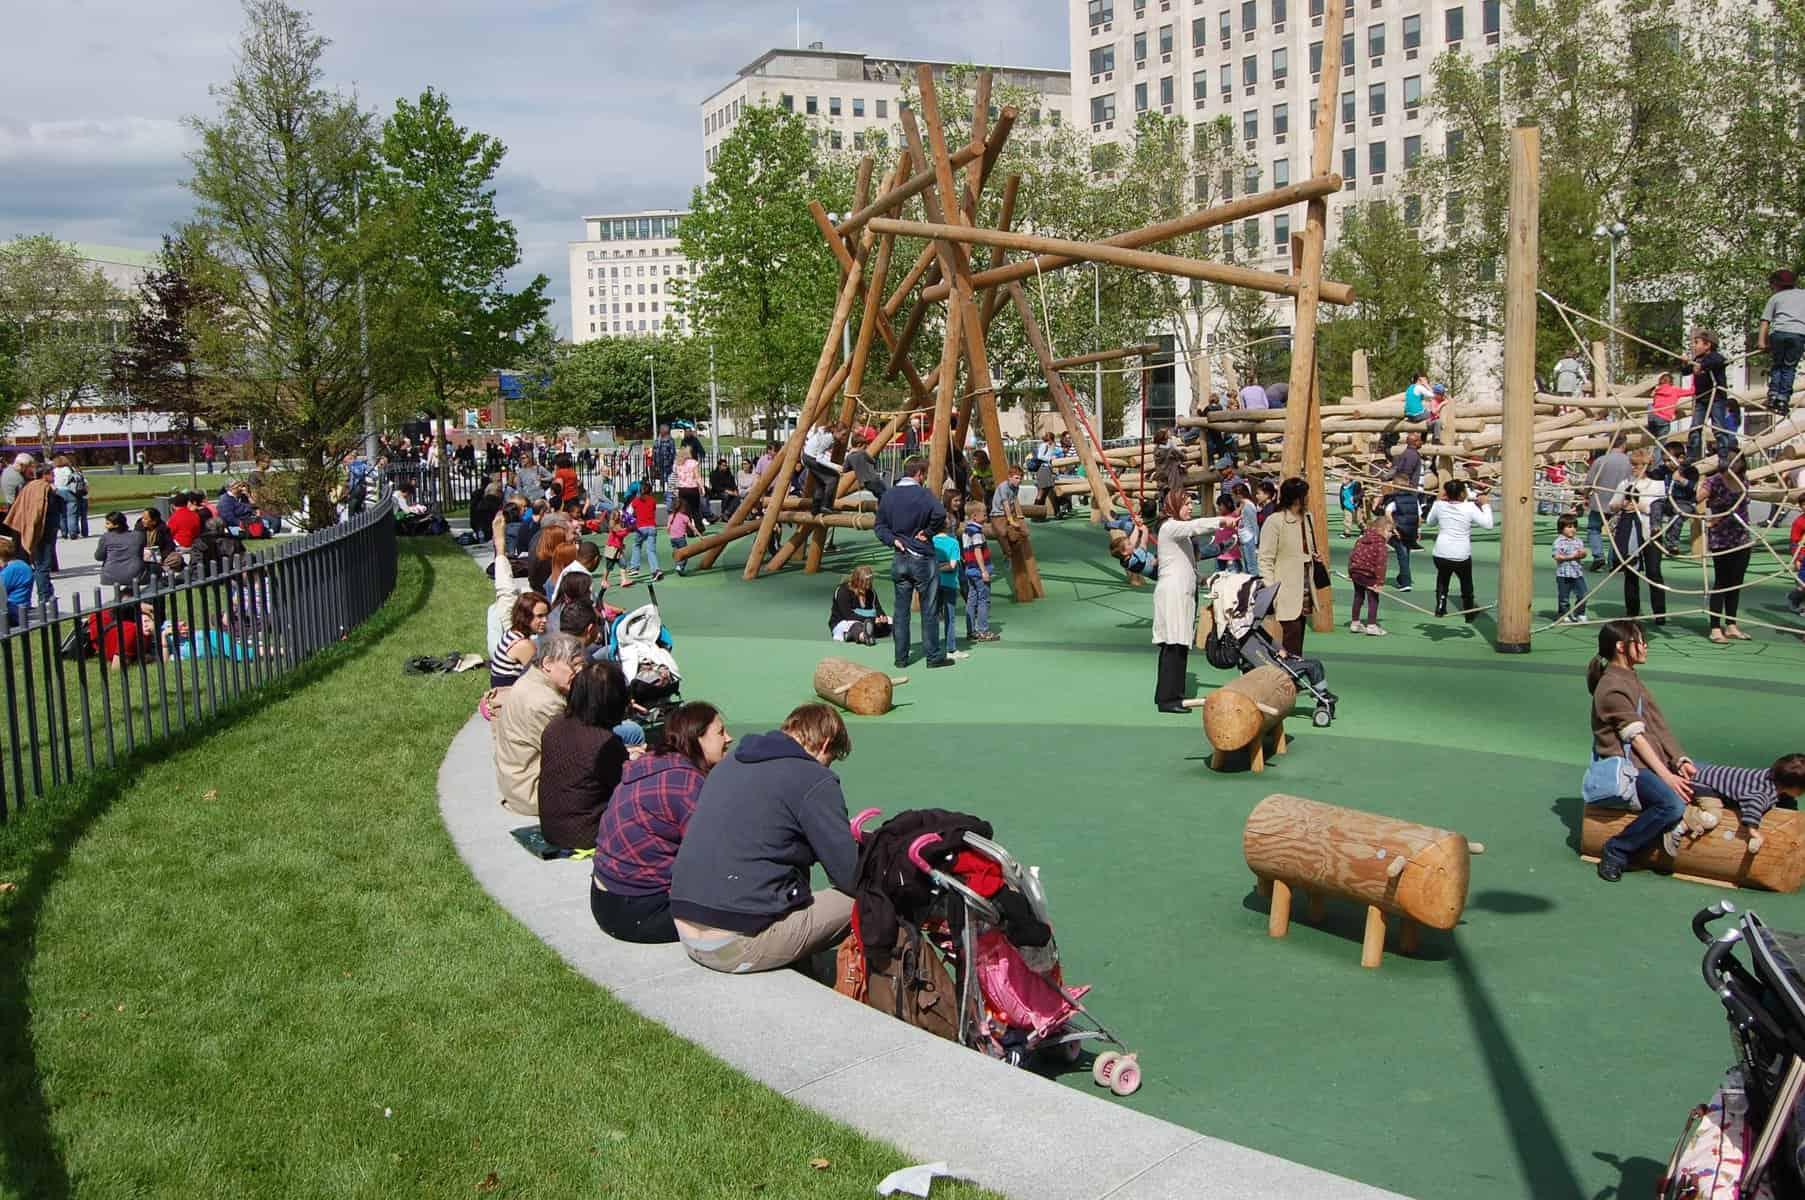 jubilee gardens london playground